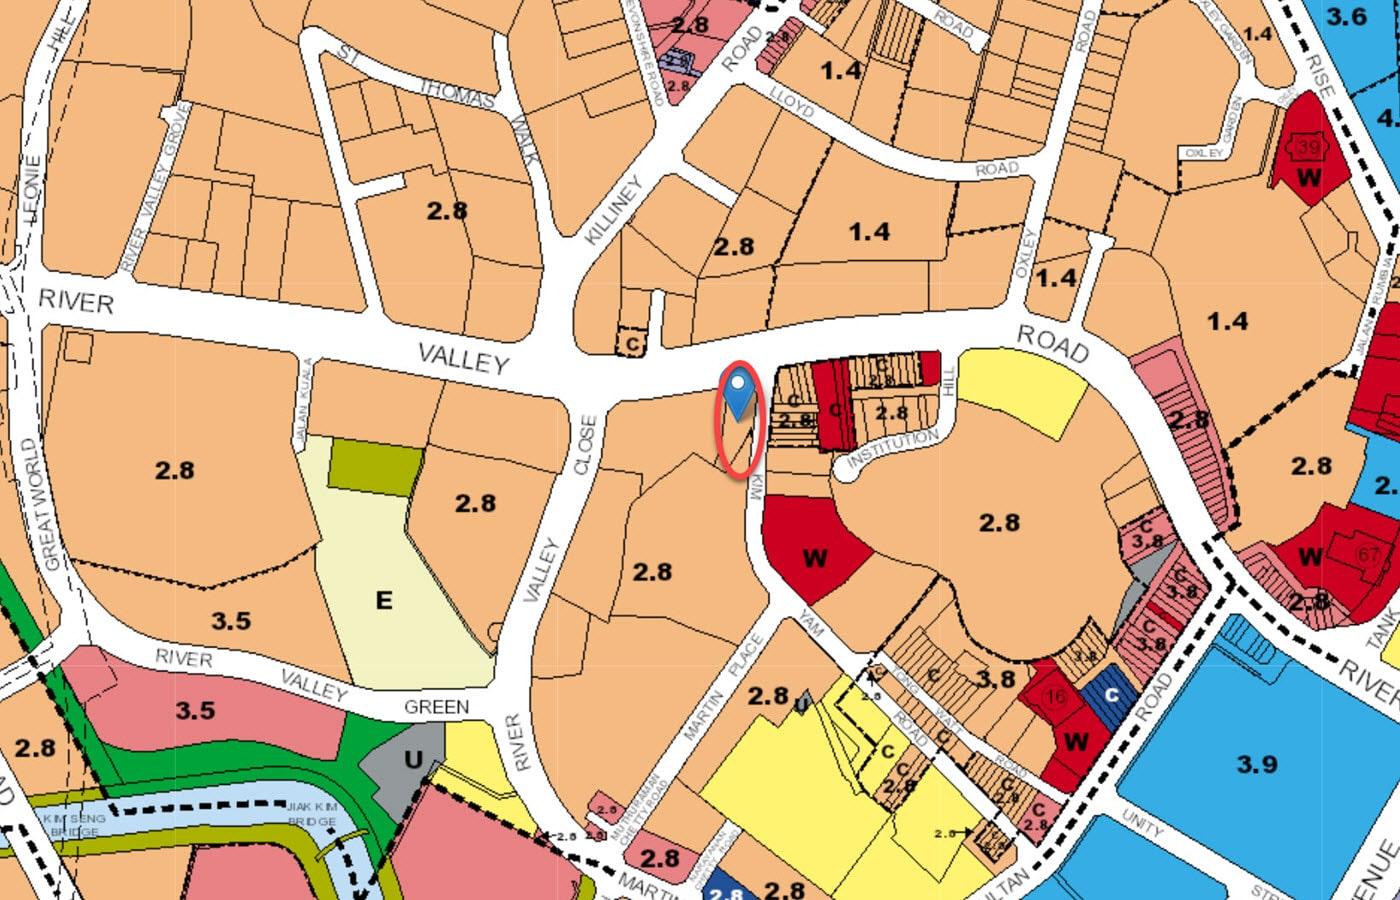 The Iveria - URA Master Plan Map